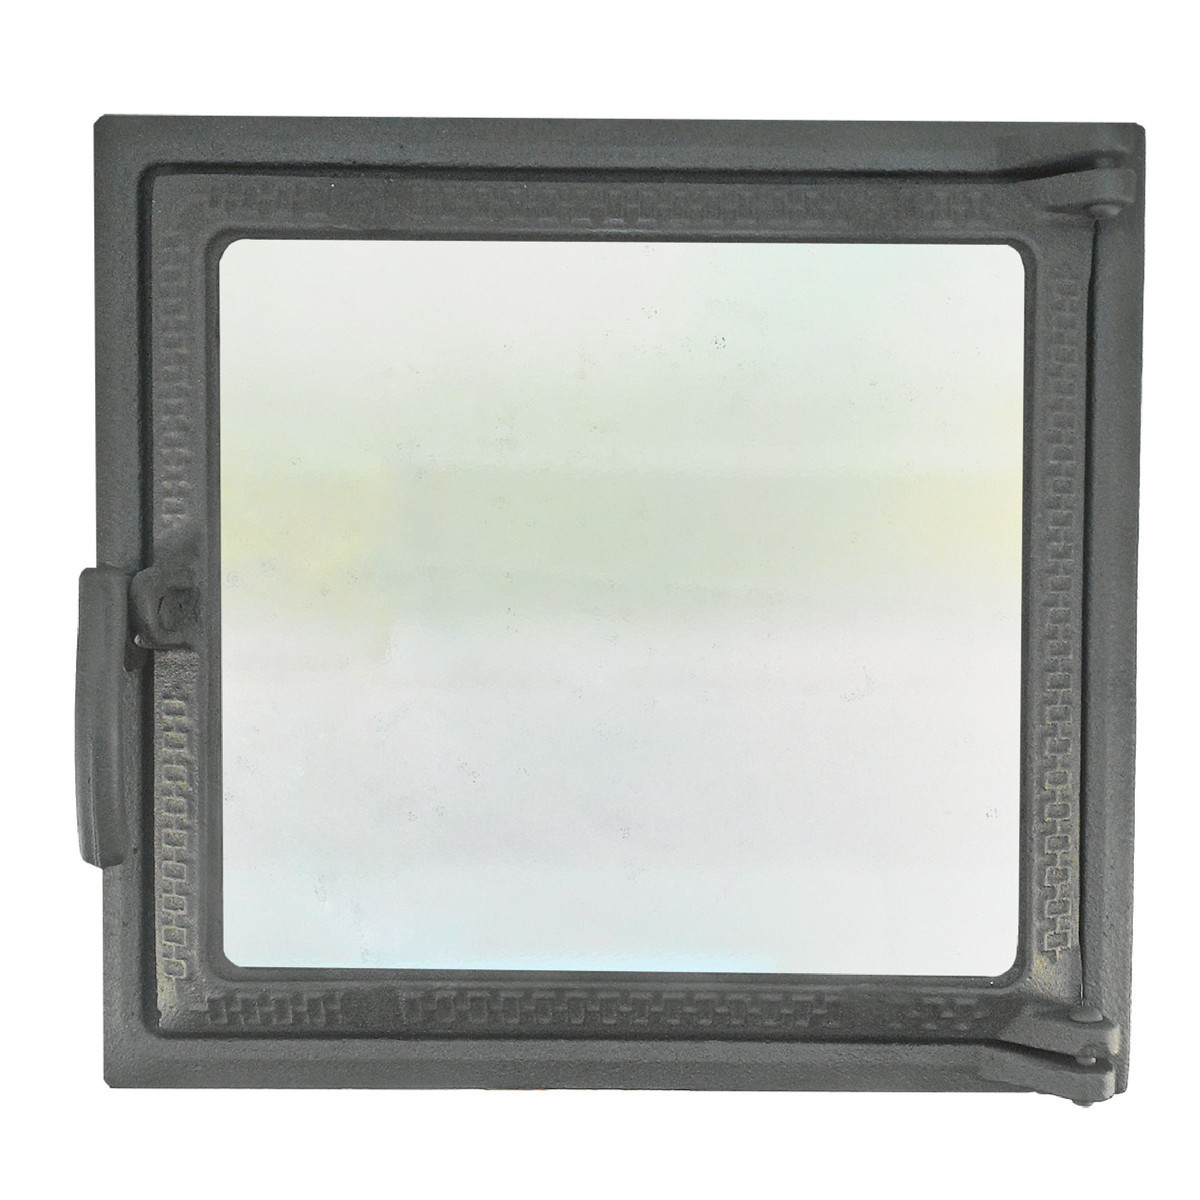 Топочная дверца для печи и камина со стеклом 102868, 270х290 мм